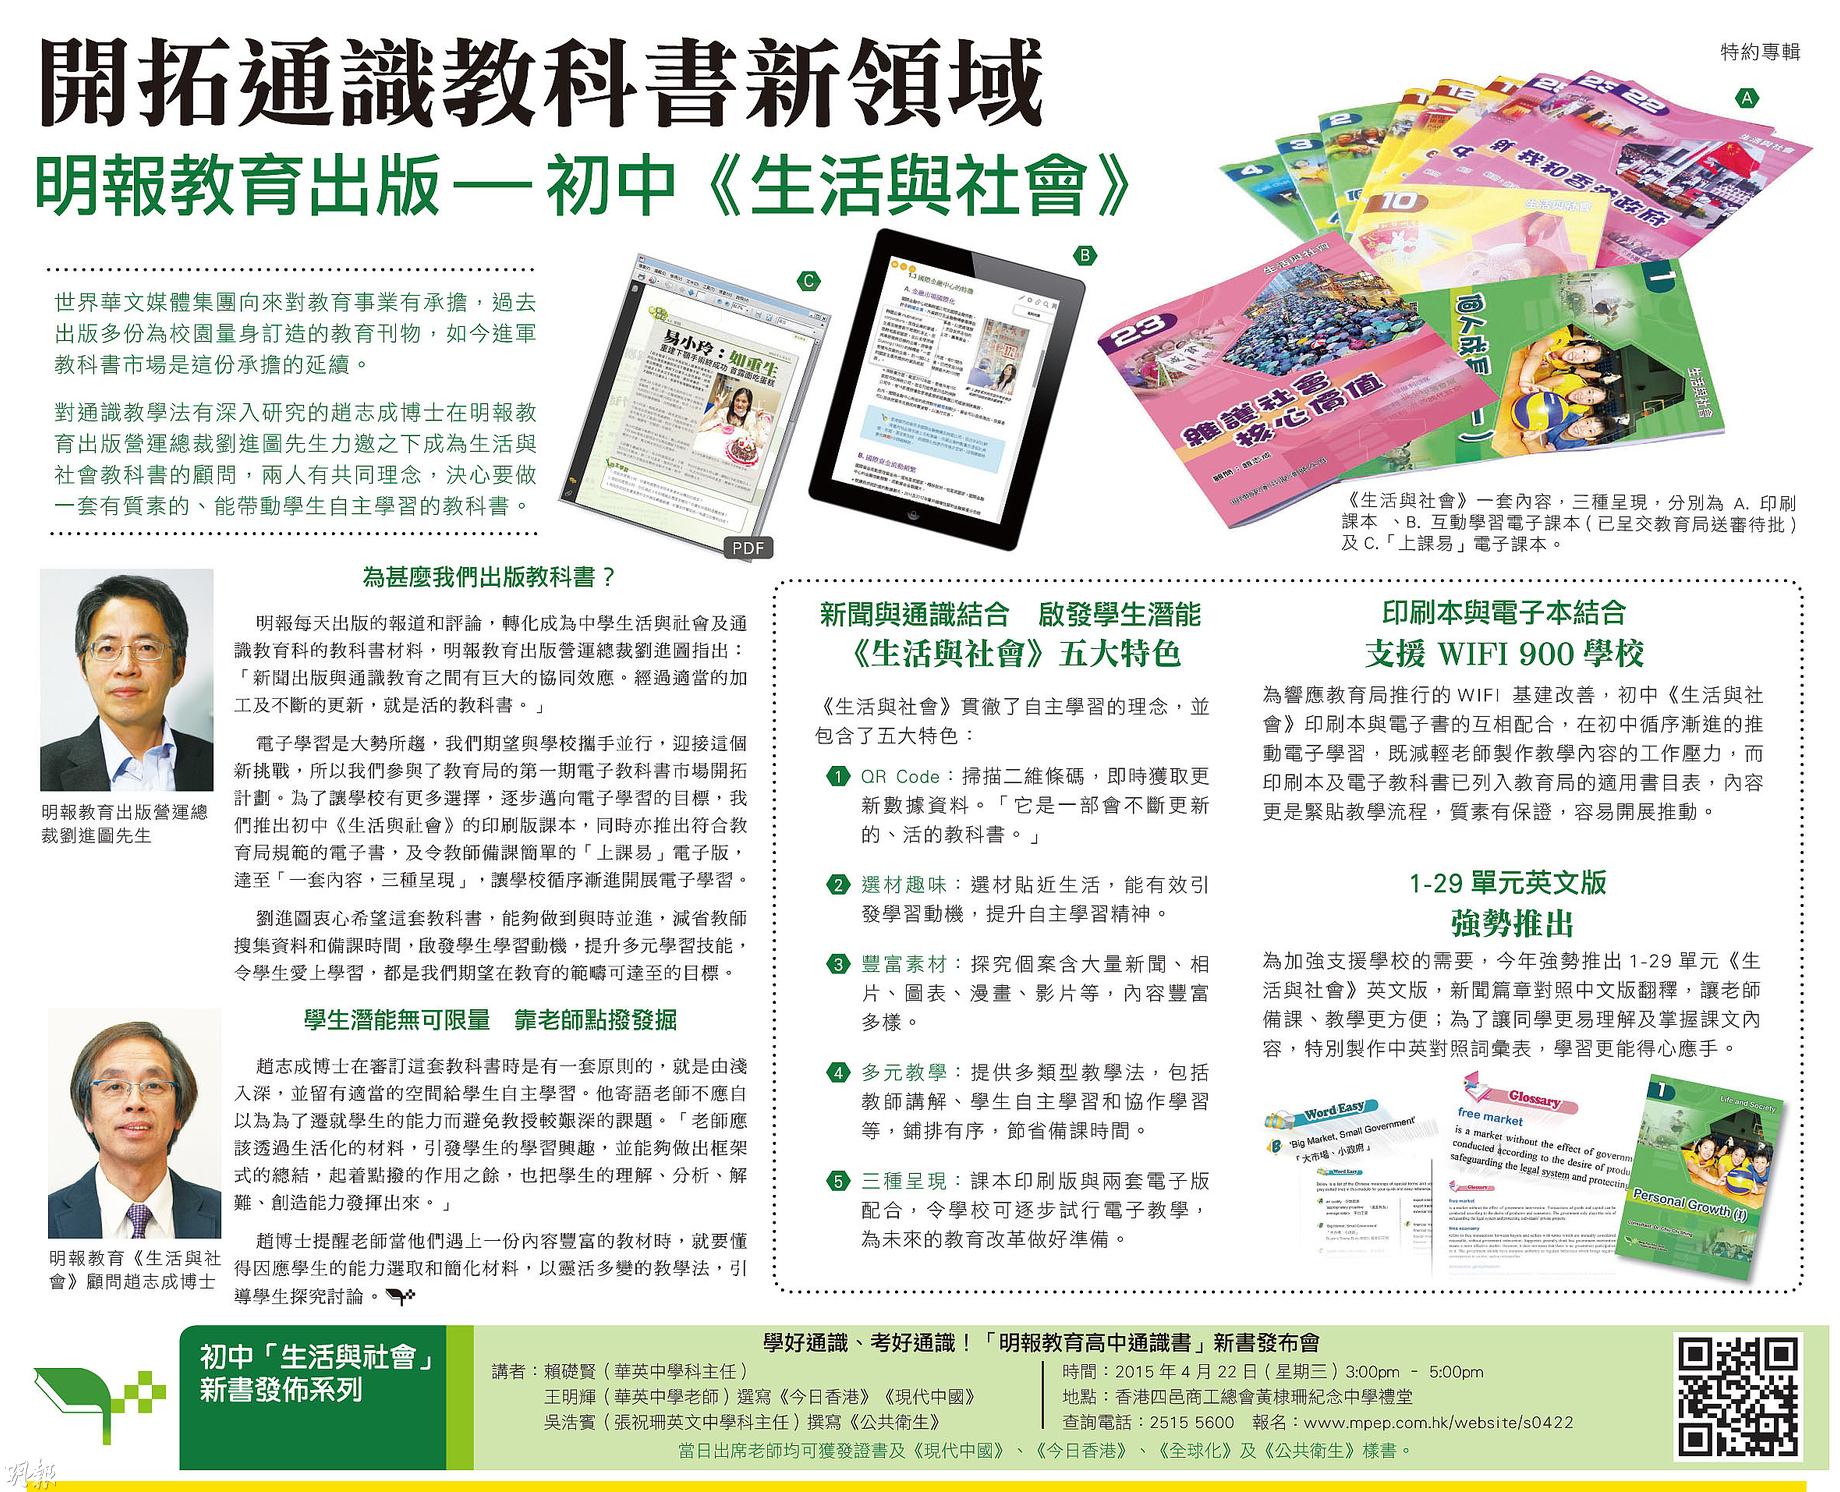 20150414-MP-A27 開拓通識教科書新領域 明報教育出版-初中《生活與社會》